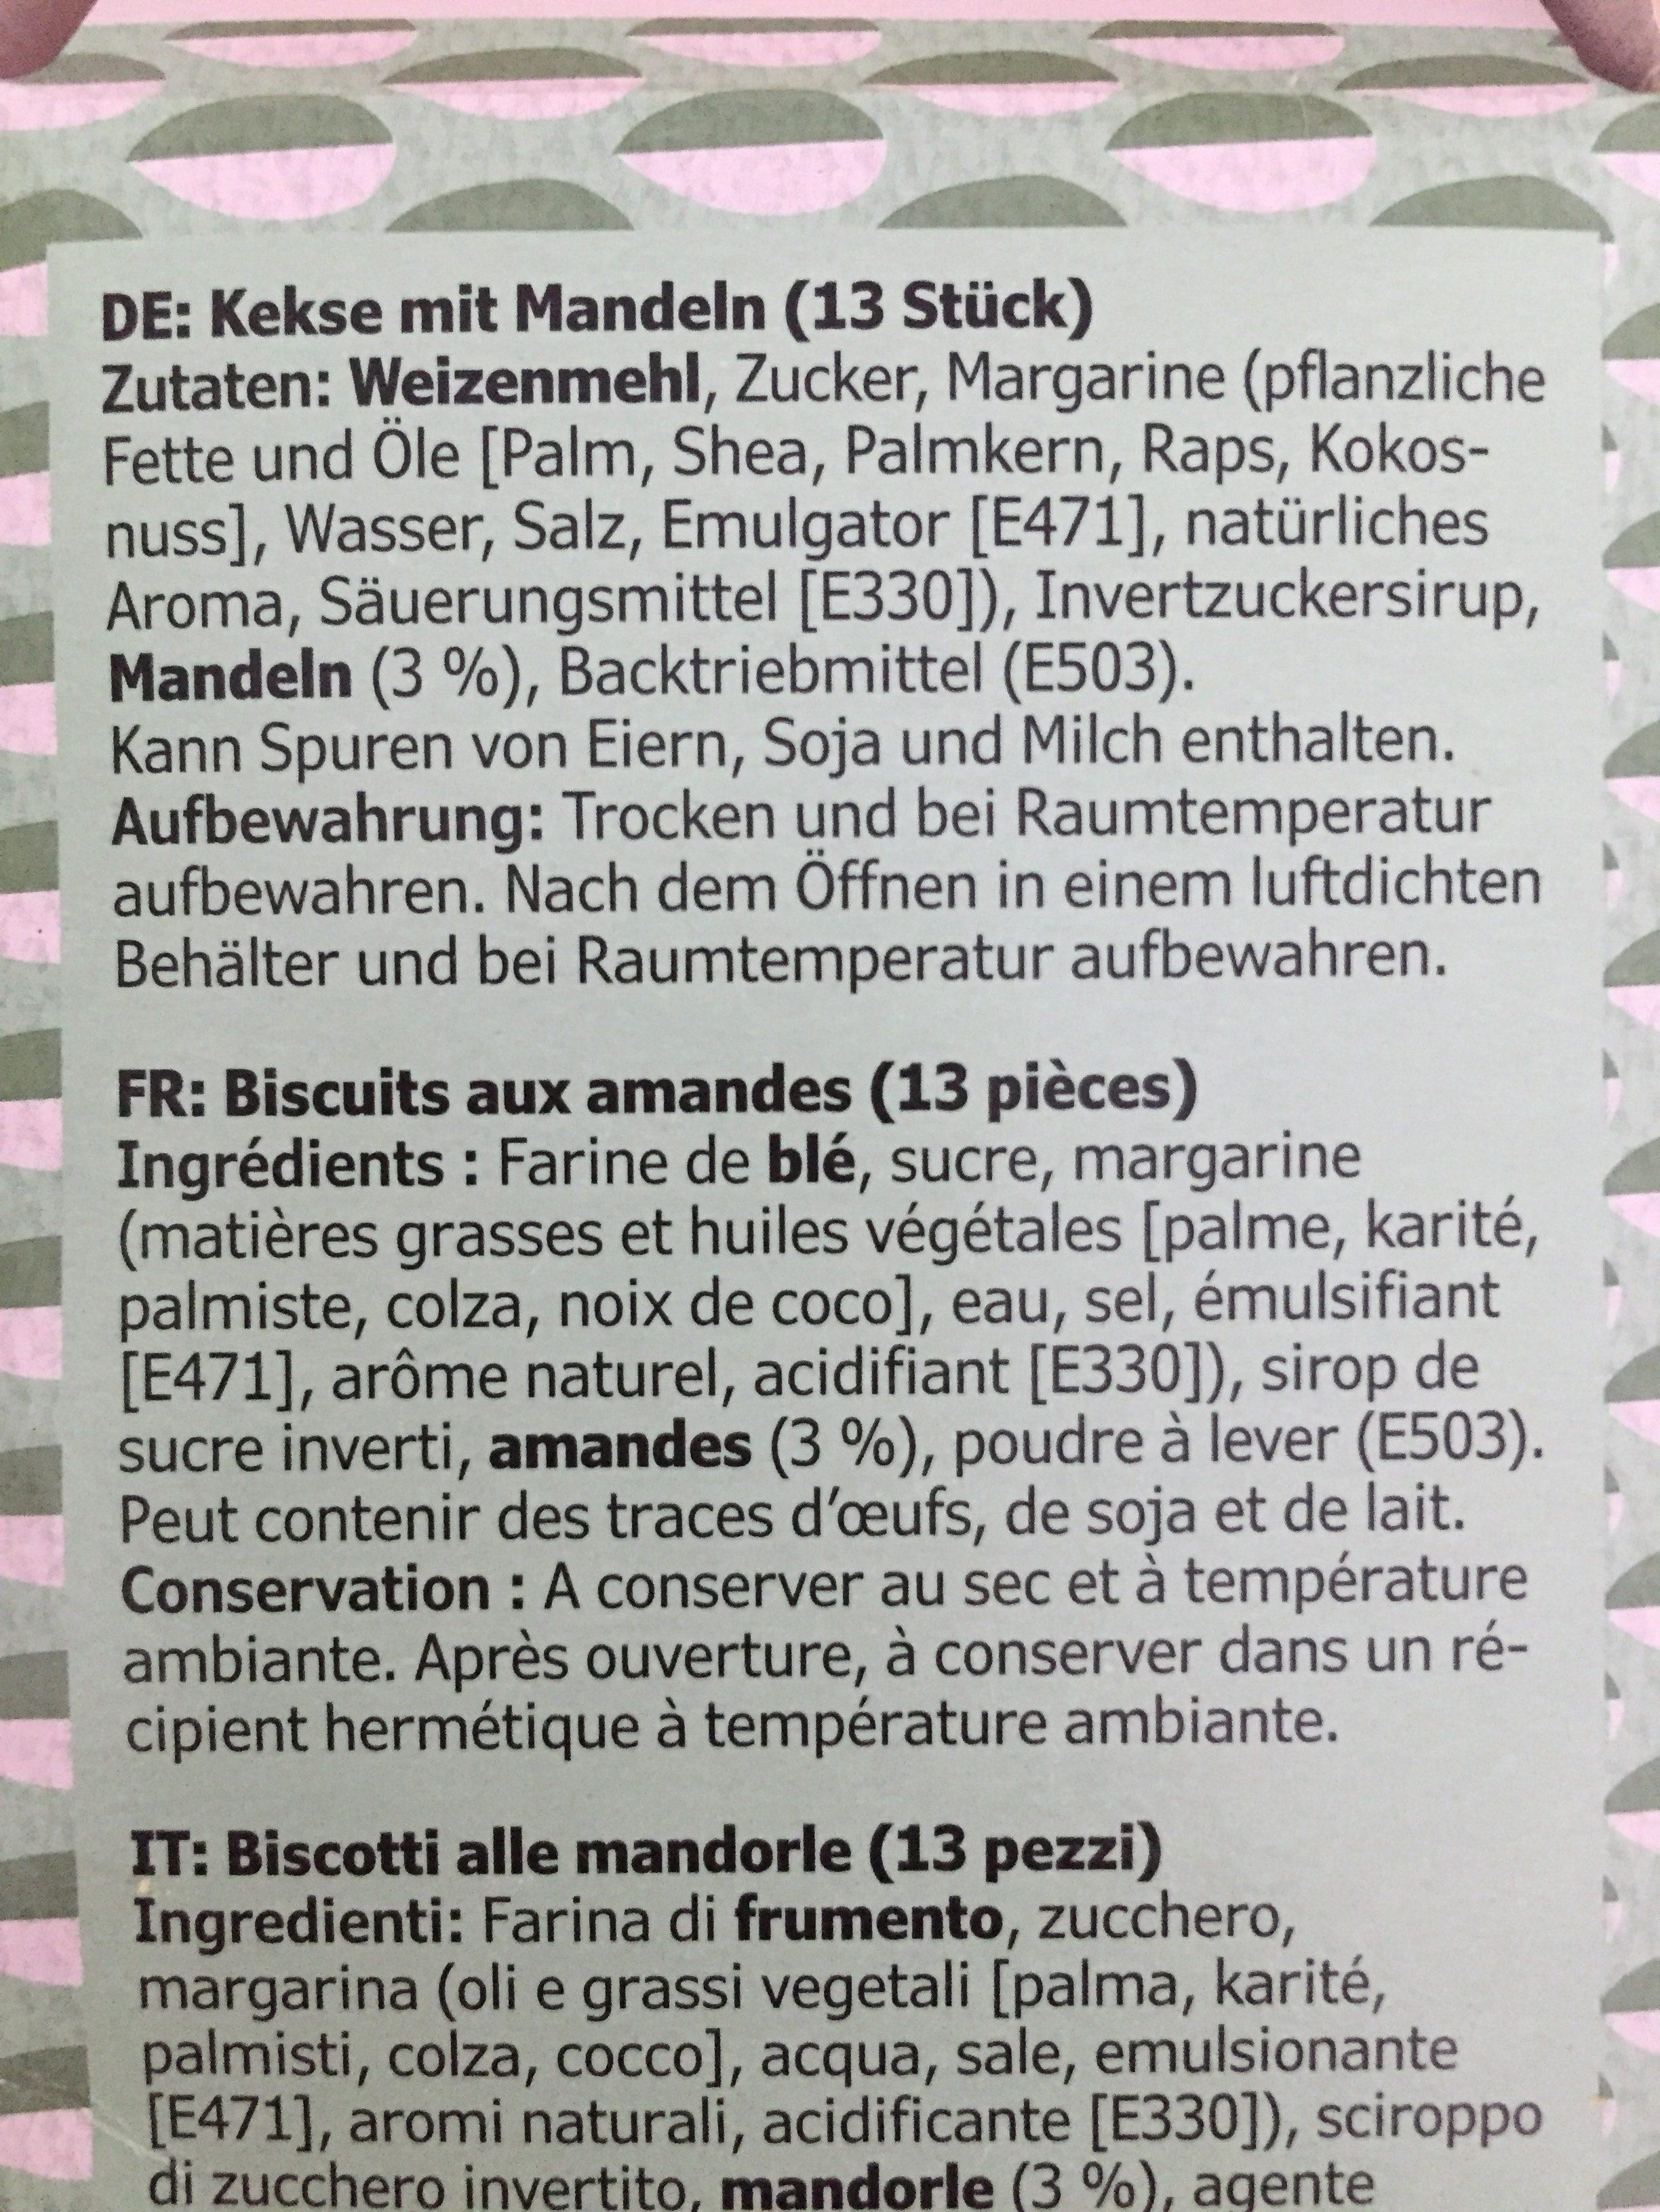 KAFFEREP biscuits aux amandes - Ingredientes - fr